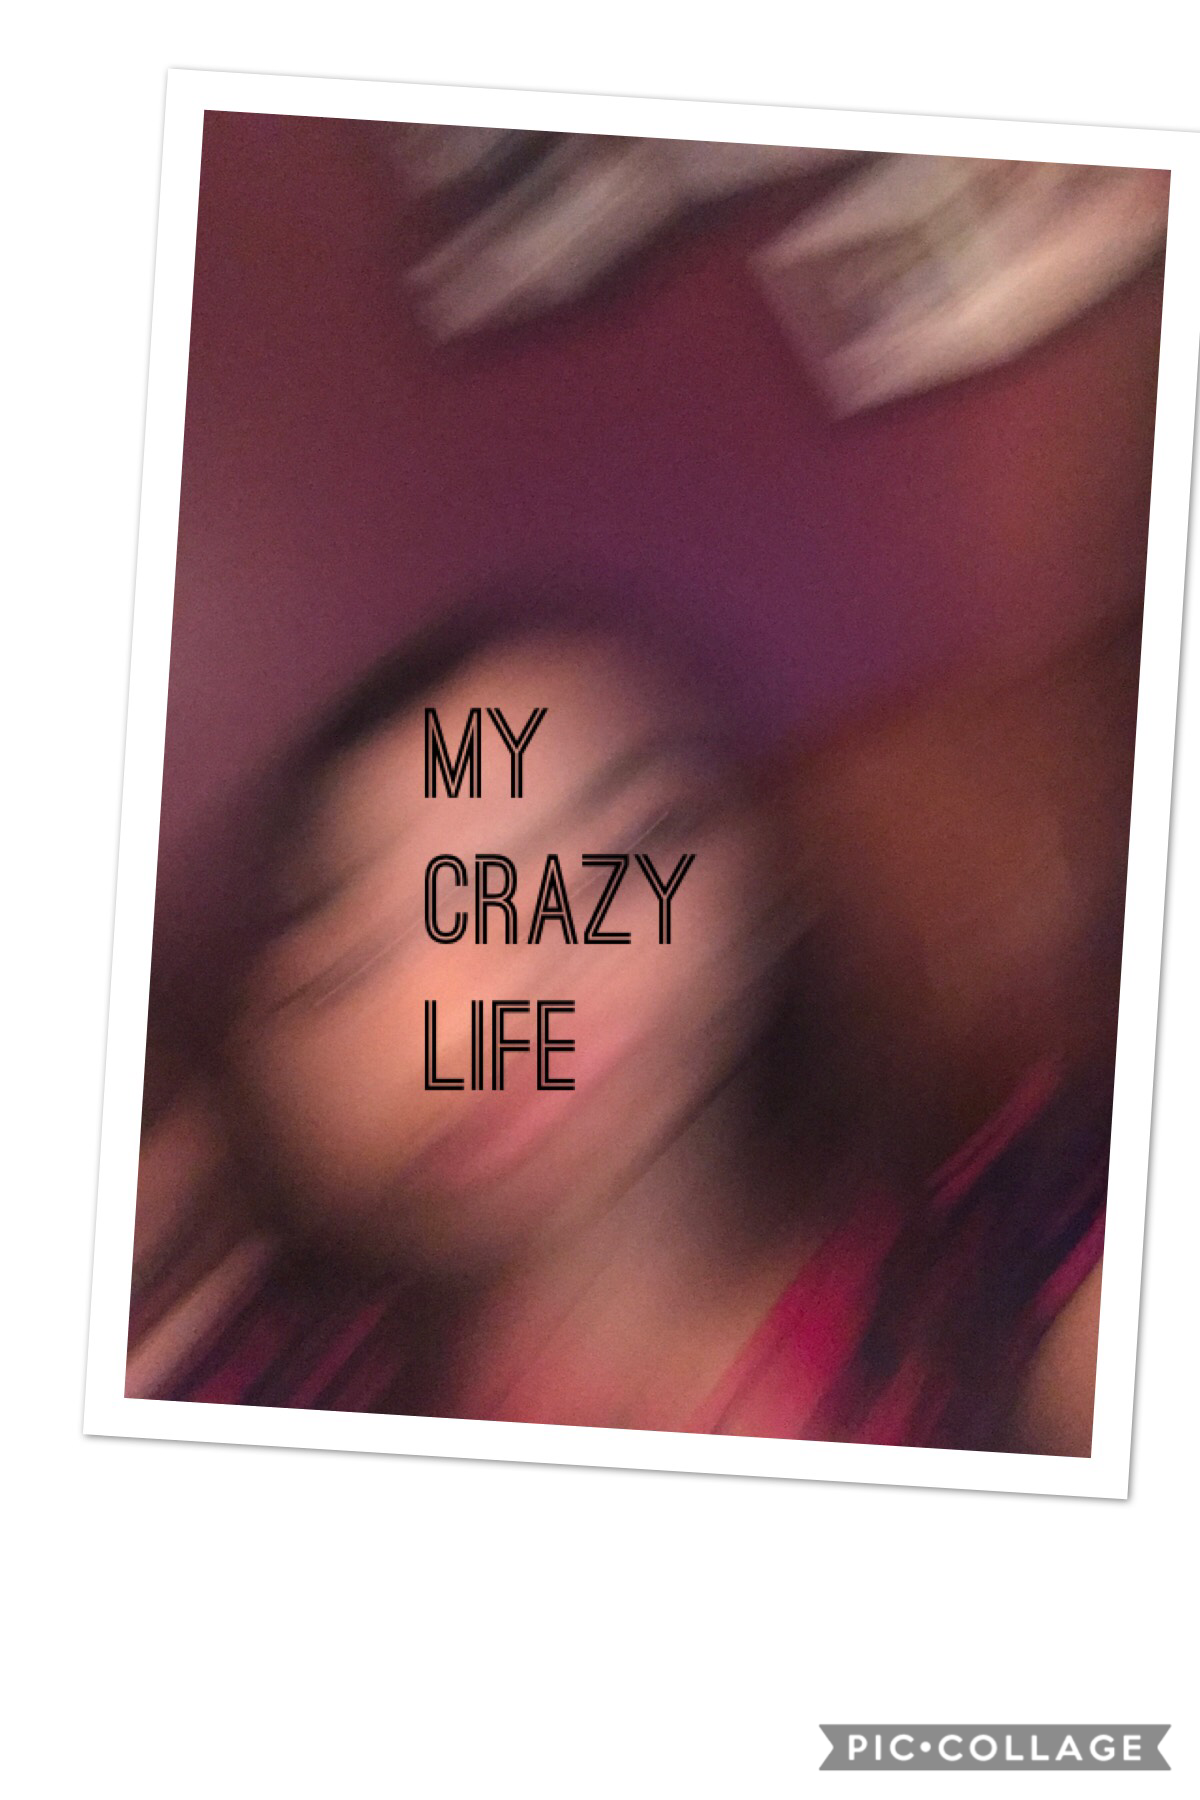 My crazy life ~tap~